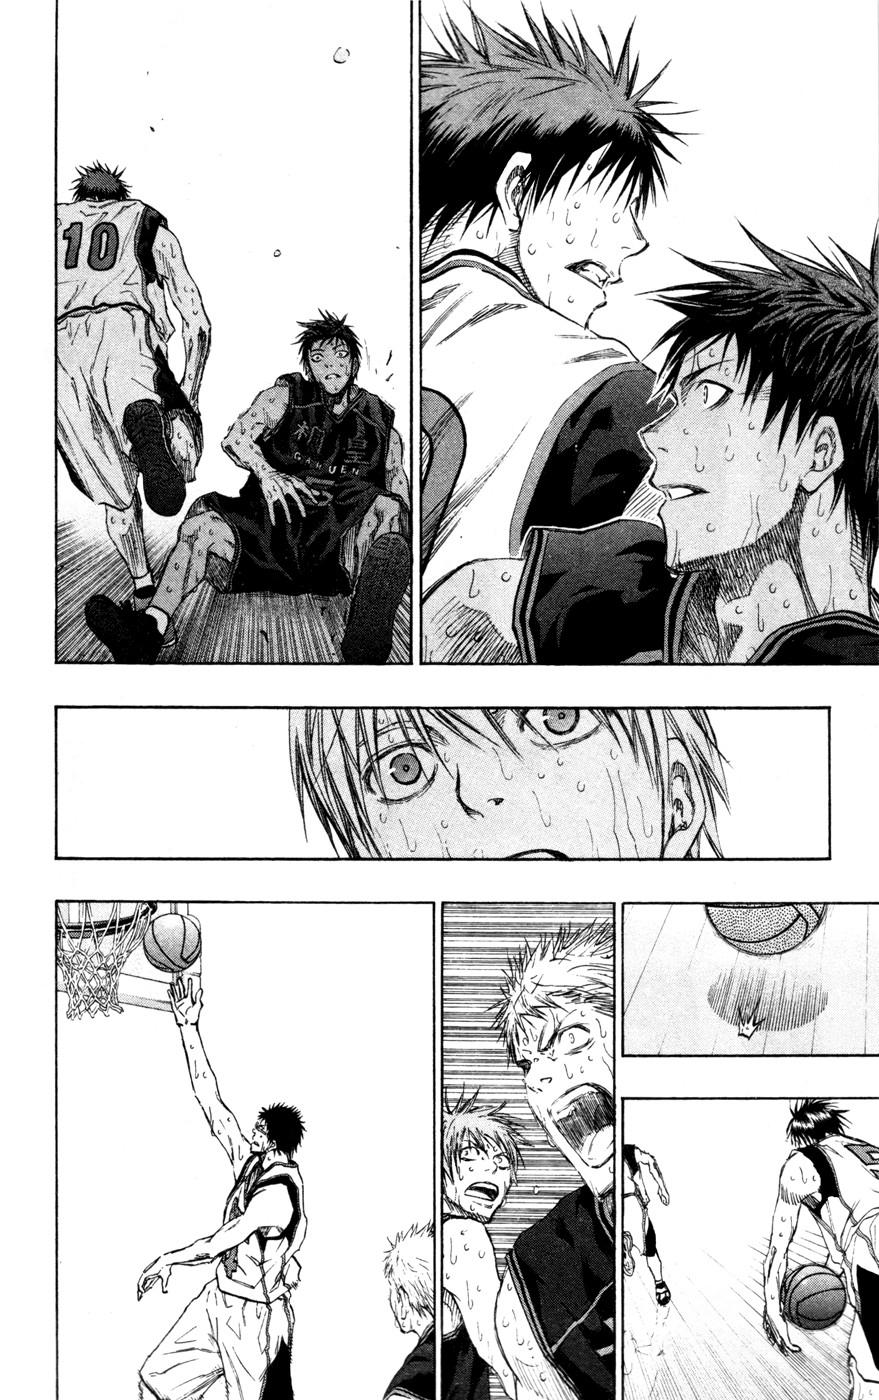 Kuroko no Basket Manga Chapter 136 - Image 24